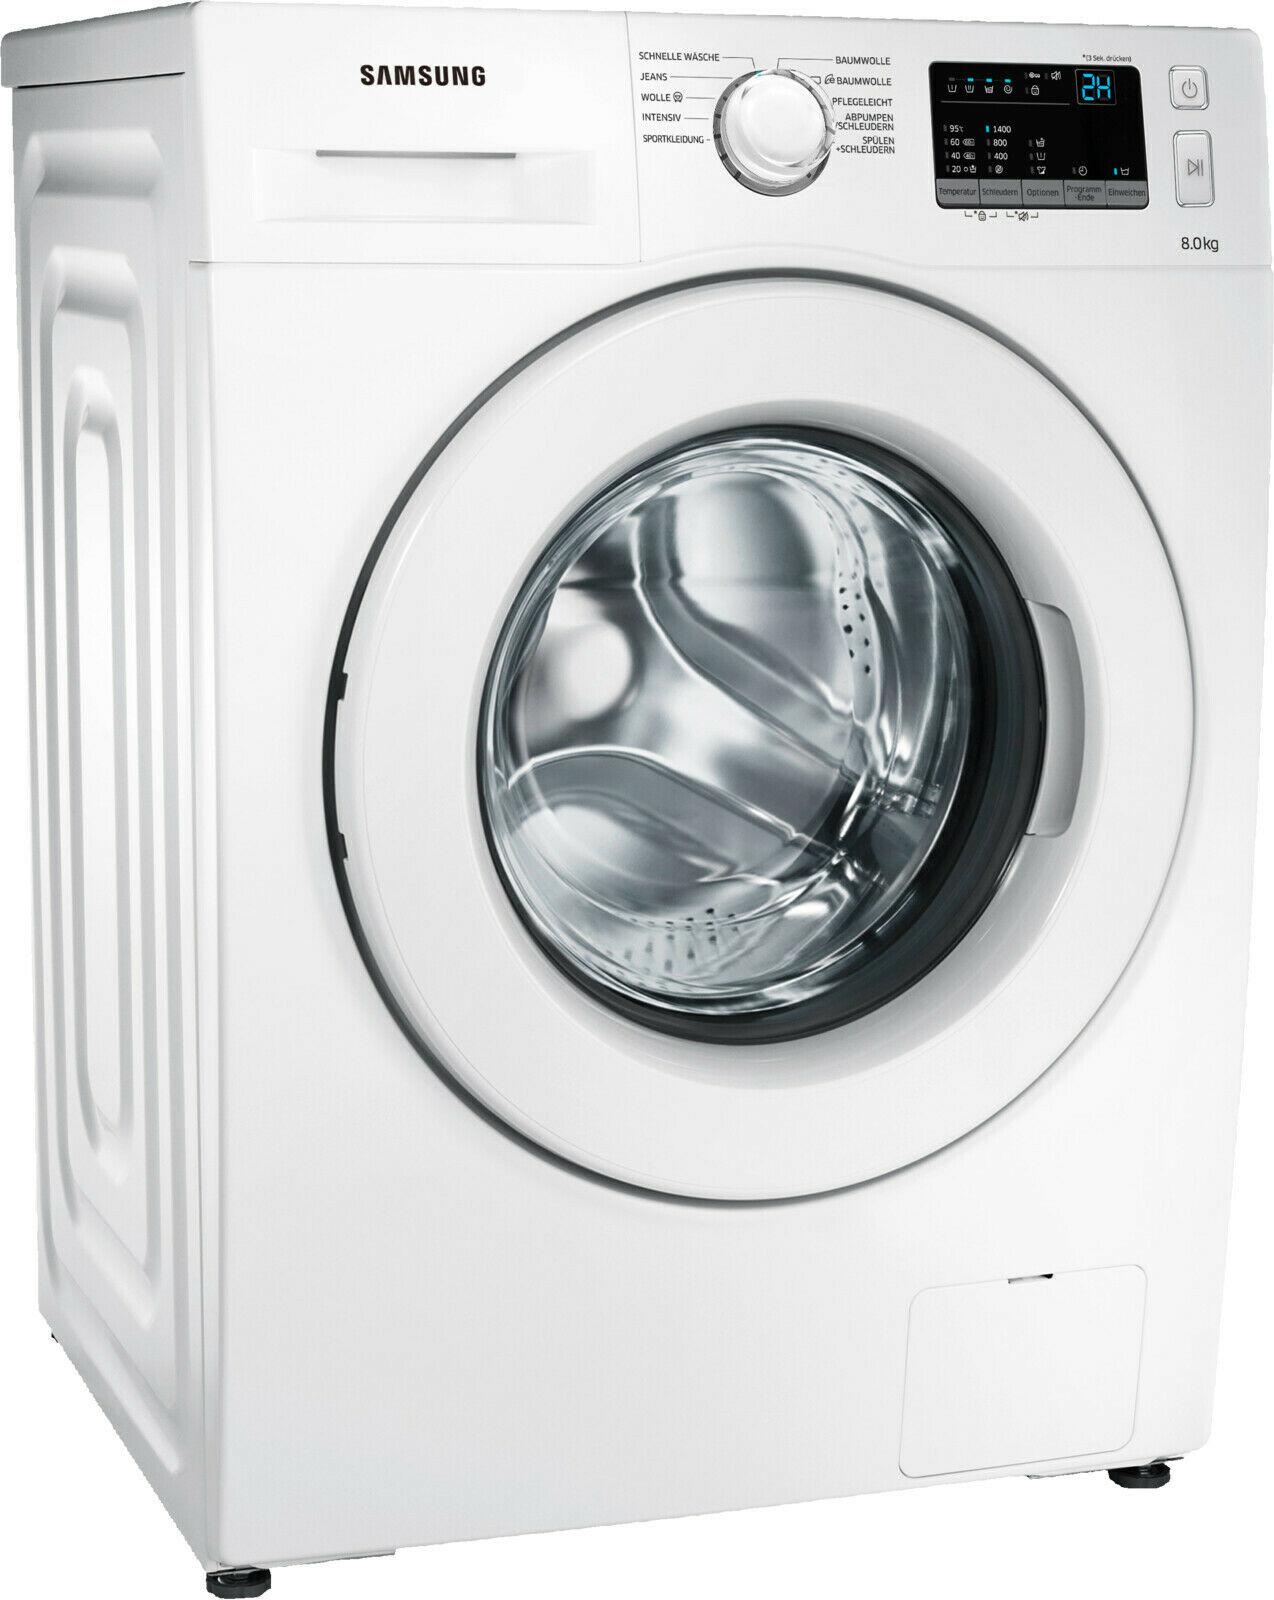 Samsung WW80J34D0KW Waschmaschine (Frontlader, 8kg, A+++, 1400U/min, 11 Programme)